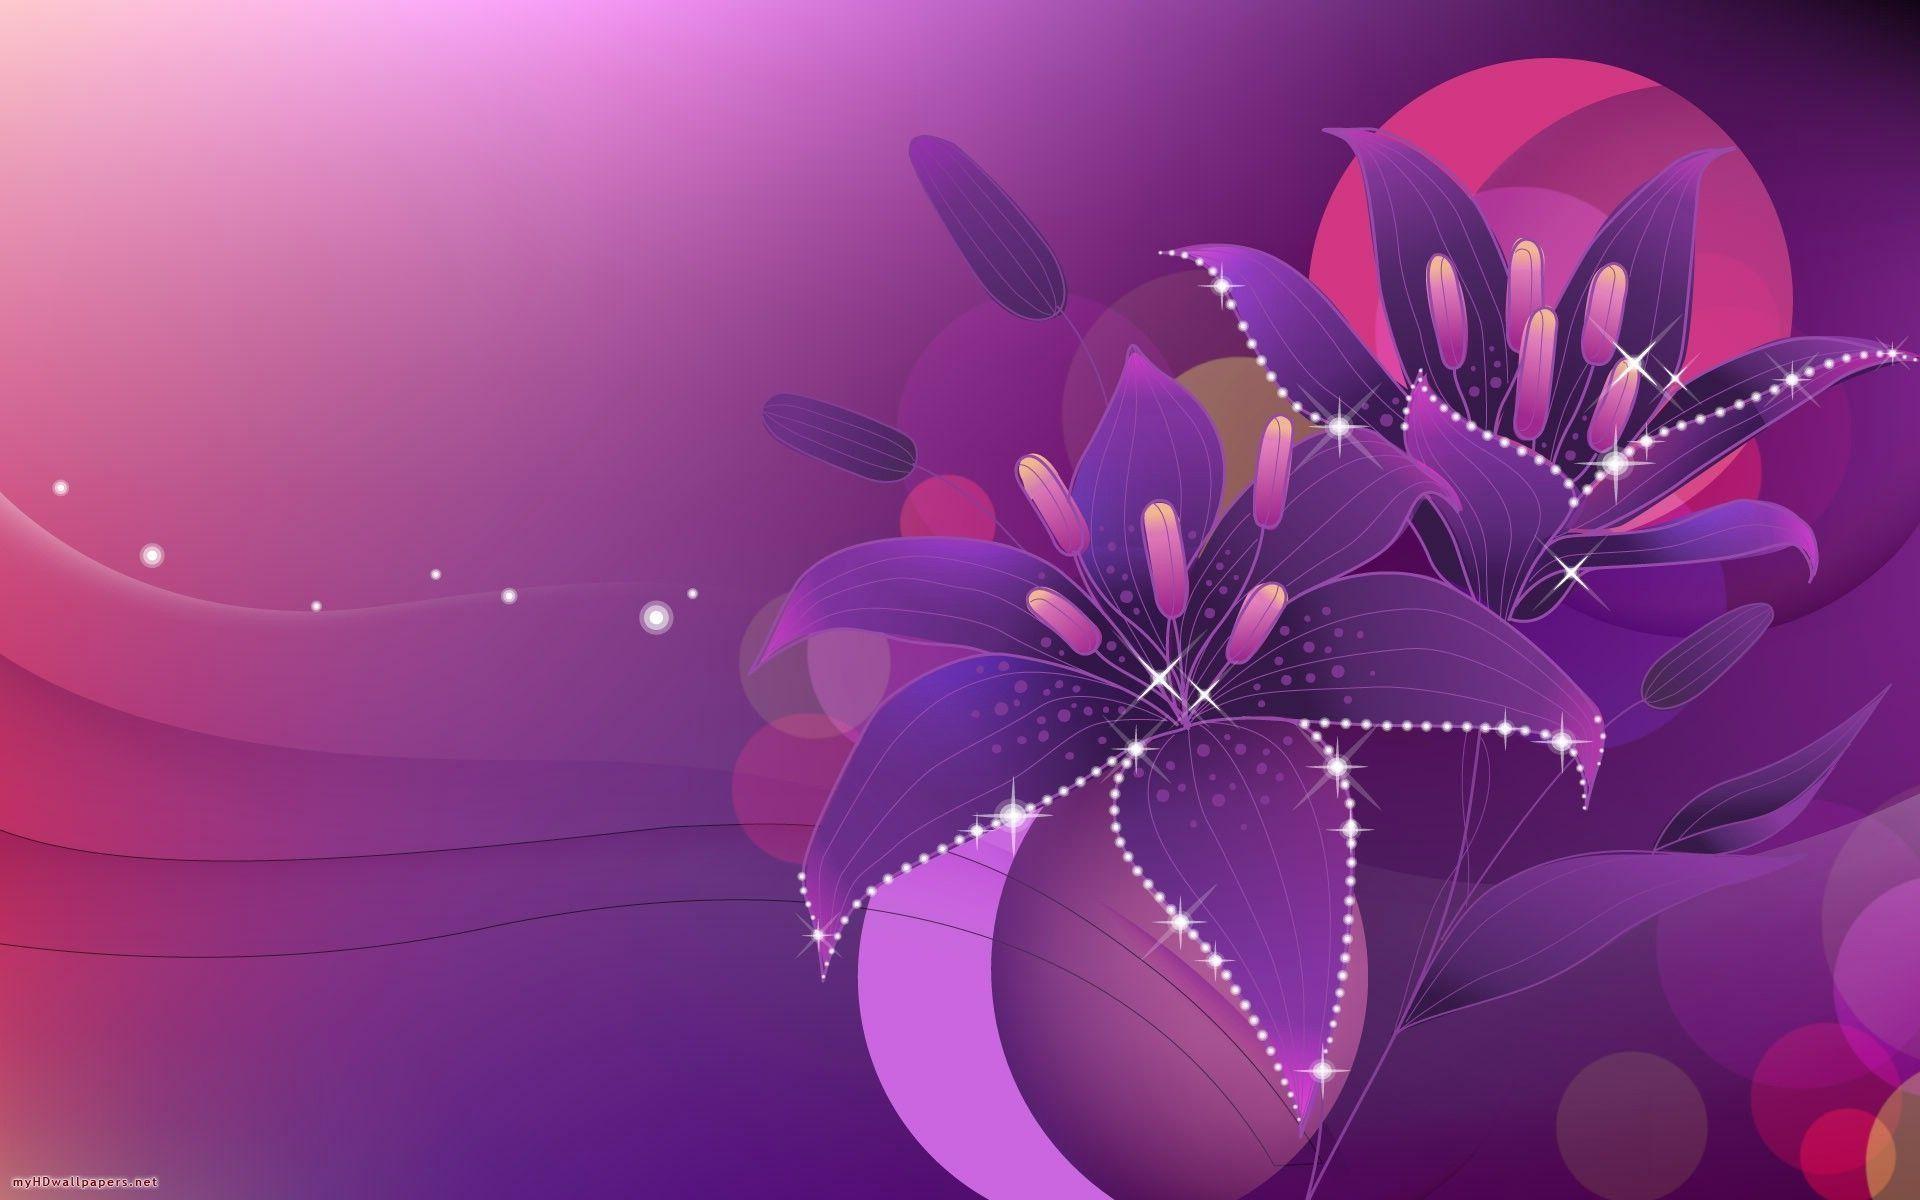 Purple Flowers Wallpapers – Full HD wallpaper search – page 14